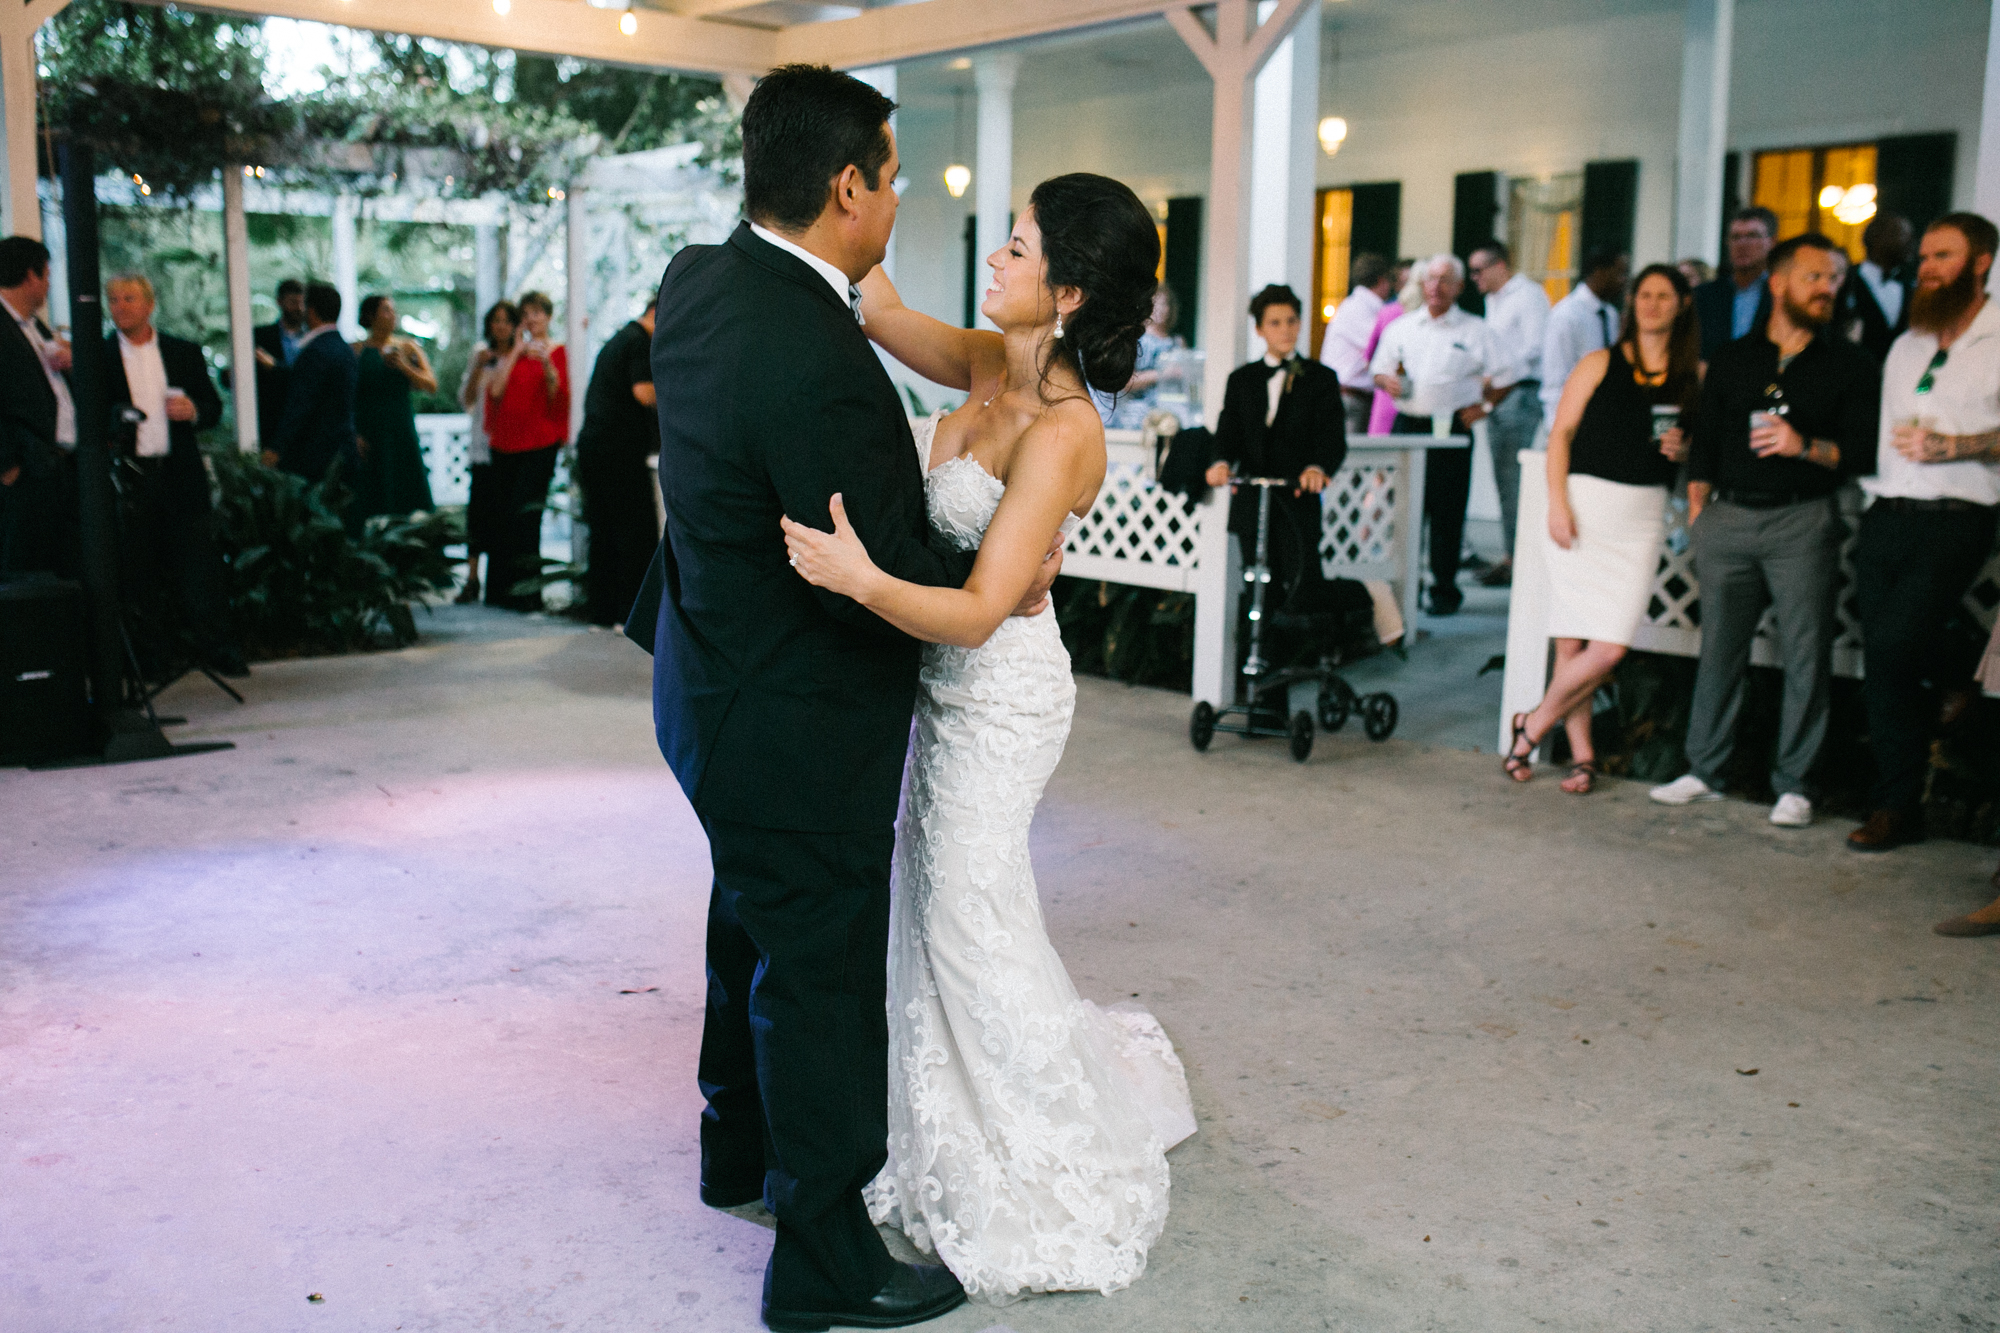 Gautier_Wedding_Photographer-175.jpg